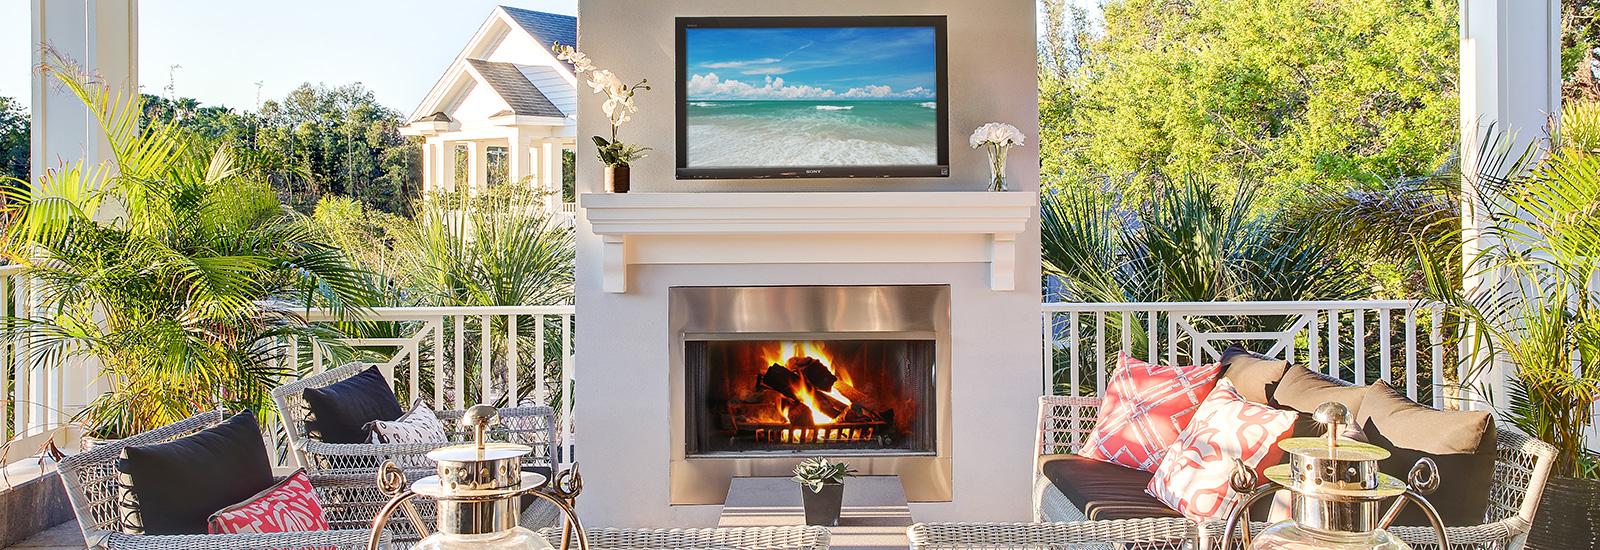 GranadaPark-outdoor-fireplace.jpg